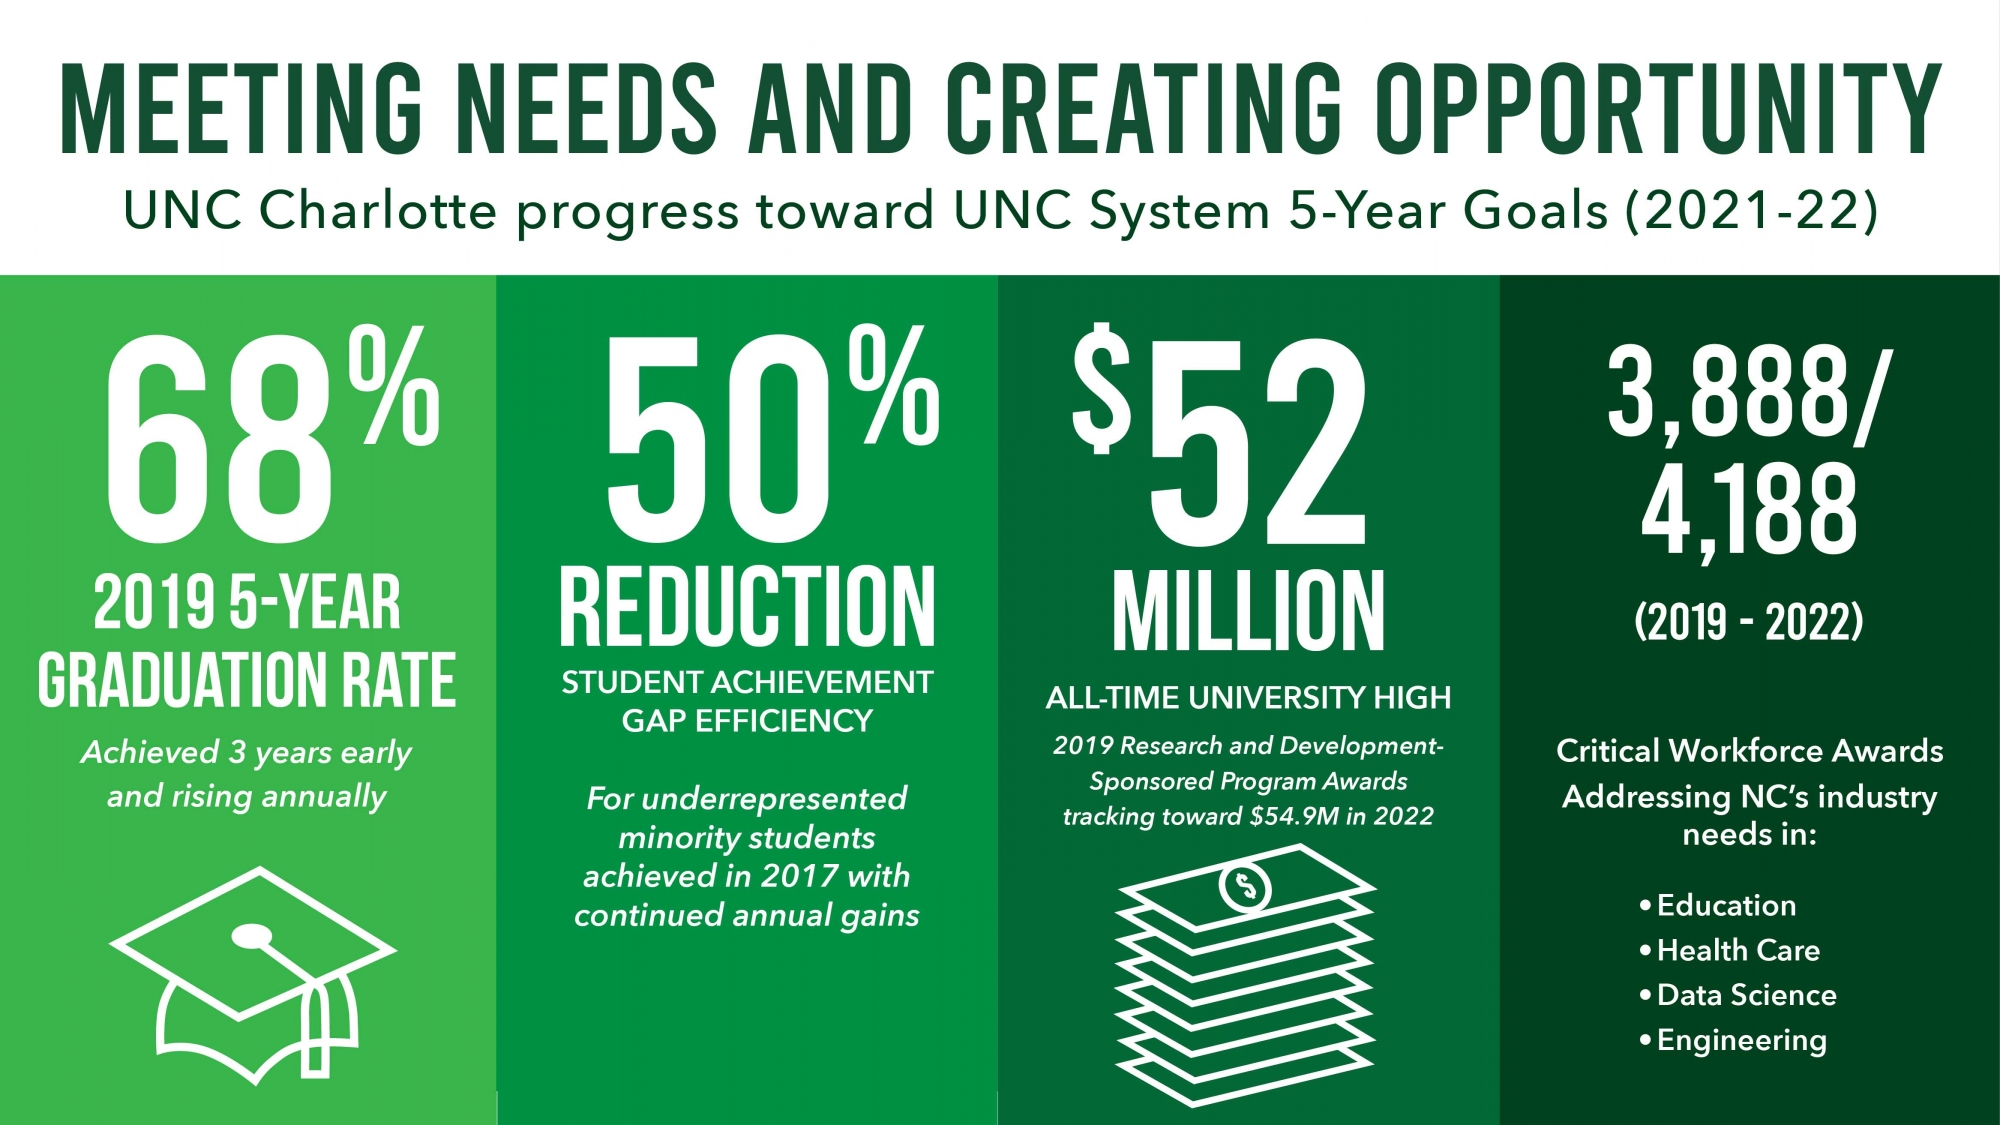 Unc Charlotte Academic Calendar 2022.Unc Charlotte Progresses Toward 5 Year System Goals Office Of The Provost Unc Charlotte